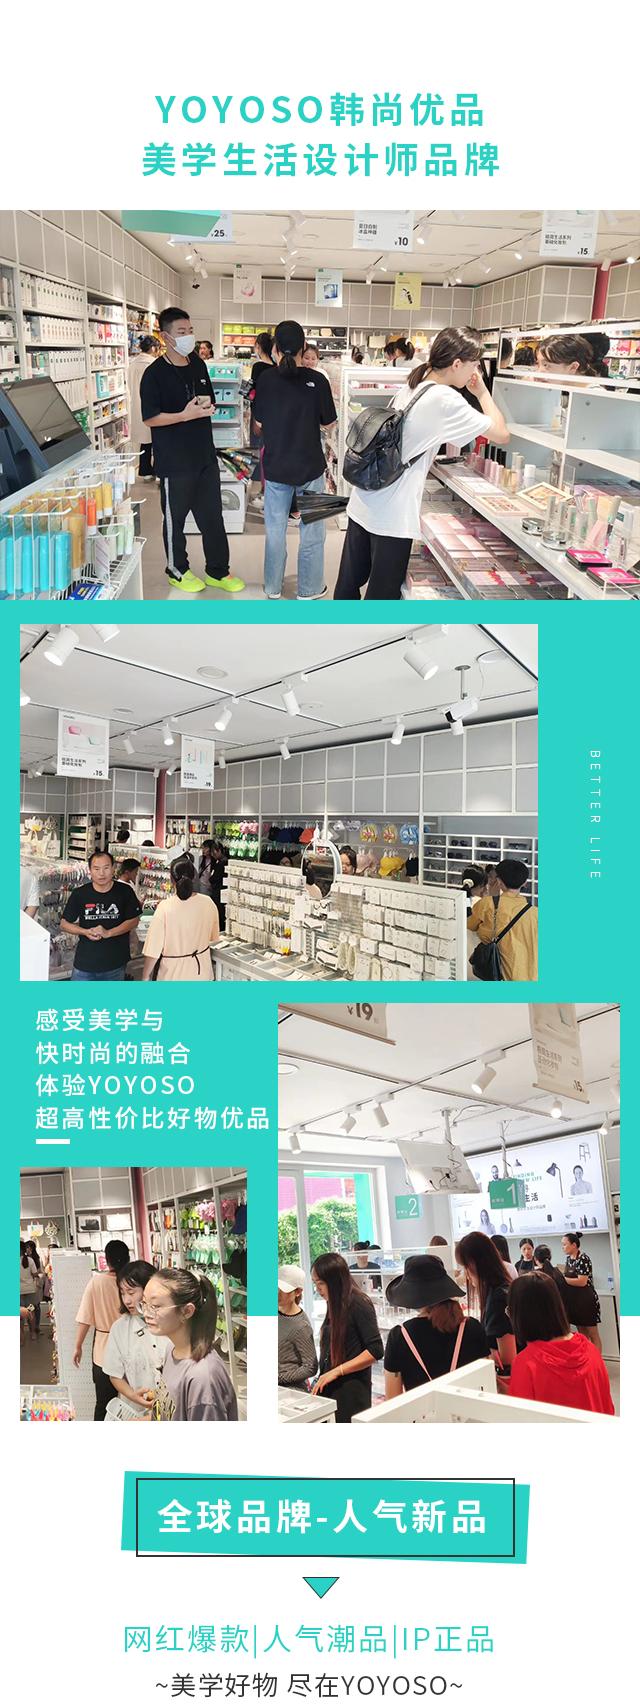 YOYOSO韩尚优品美学生活设计师品牌